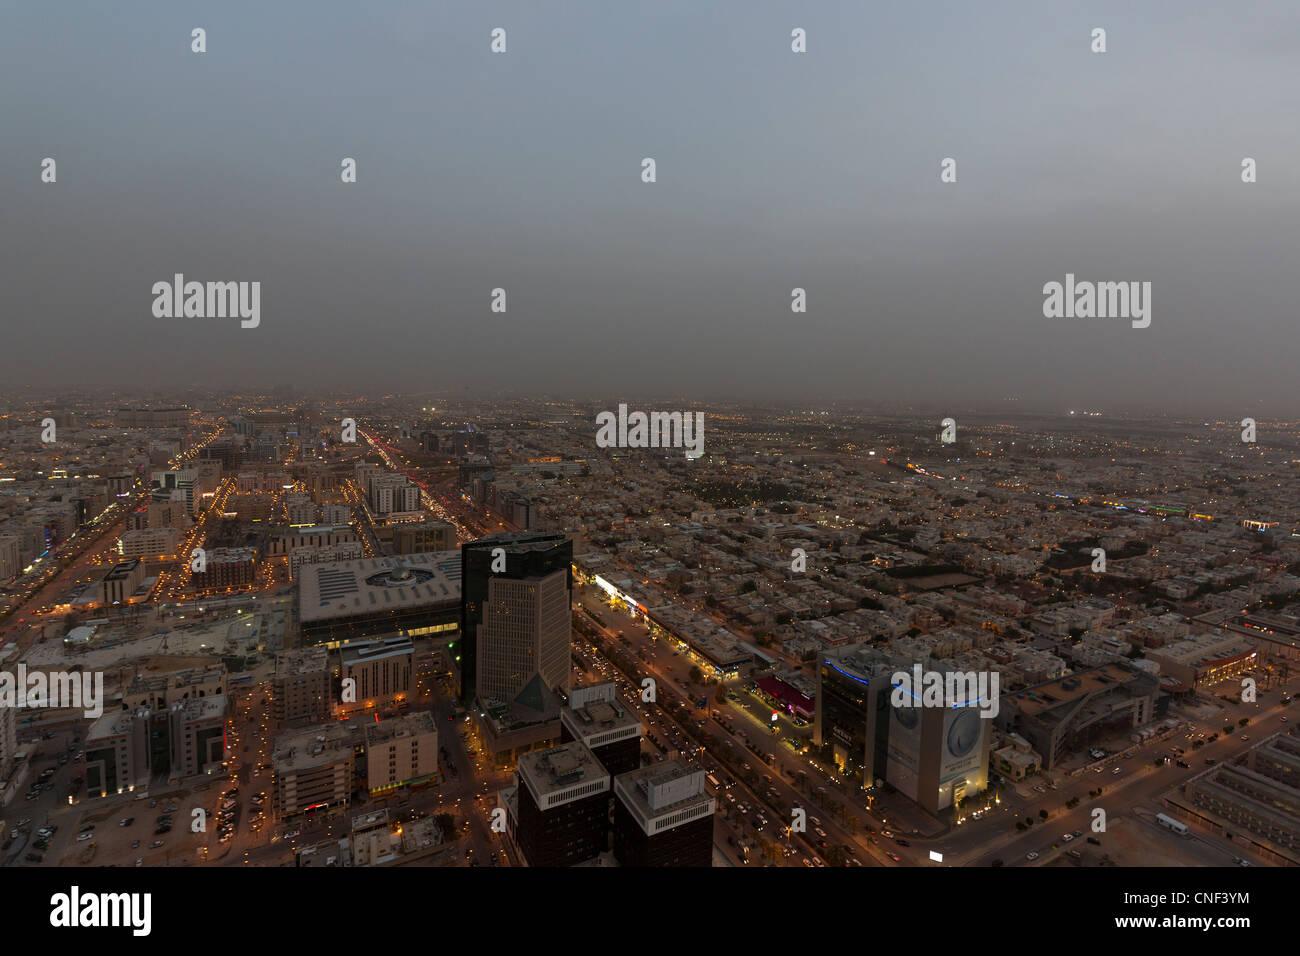 Avis de Riyadh, Arabie Saoudite Photo Stock